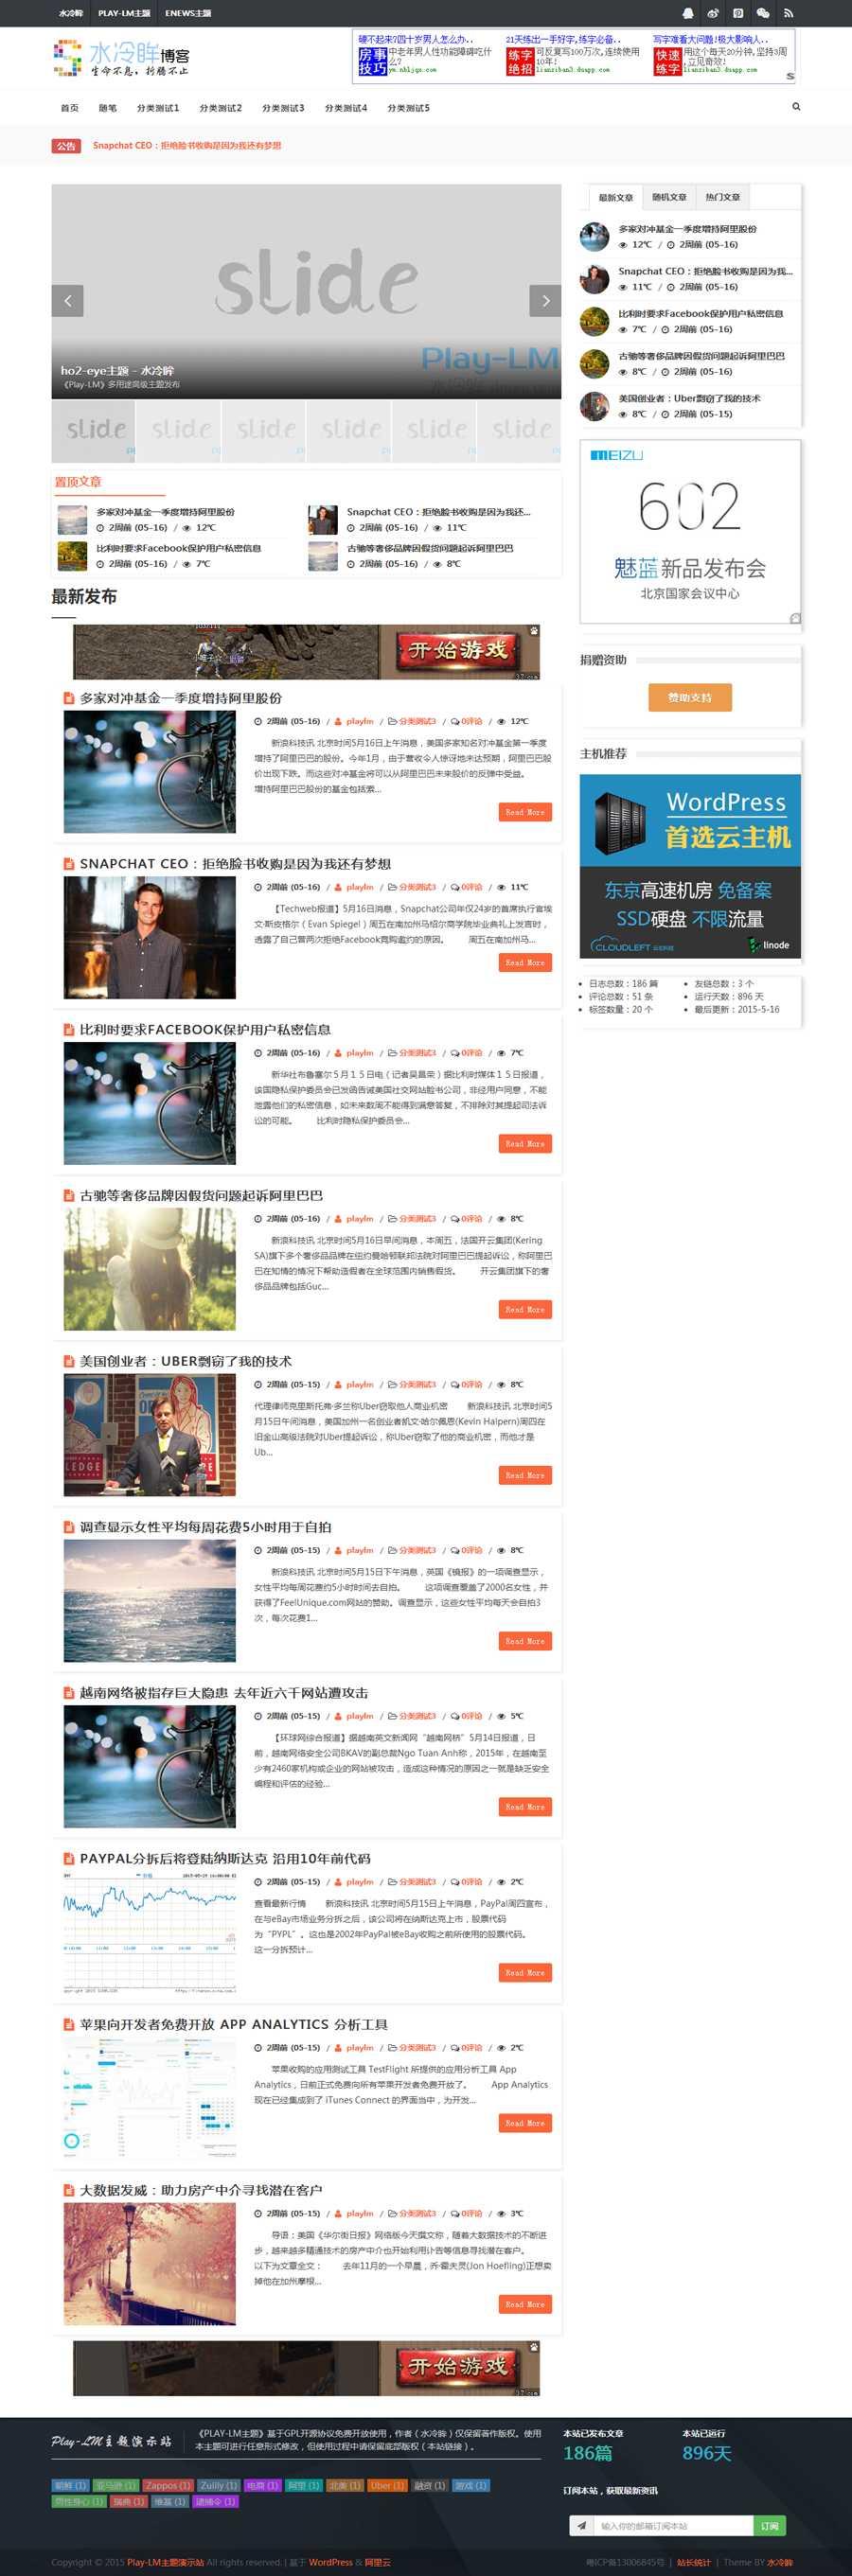 PlayLM - 简灰高级WordPress博客/CMS双模式主题-WP酷